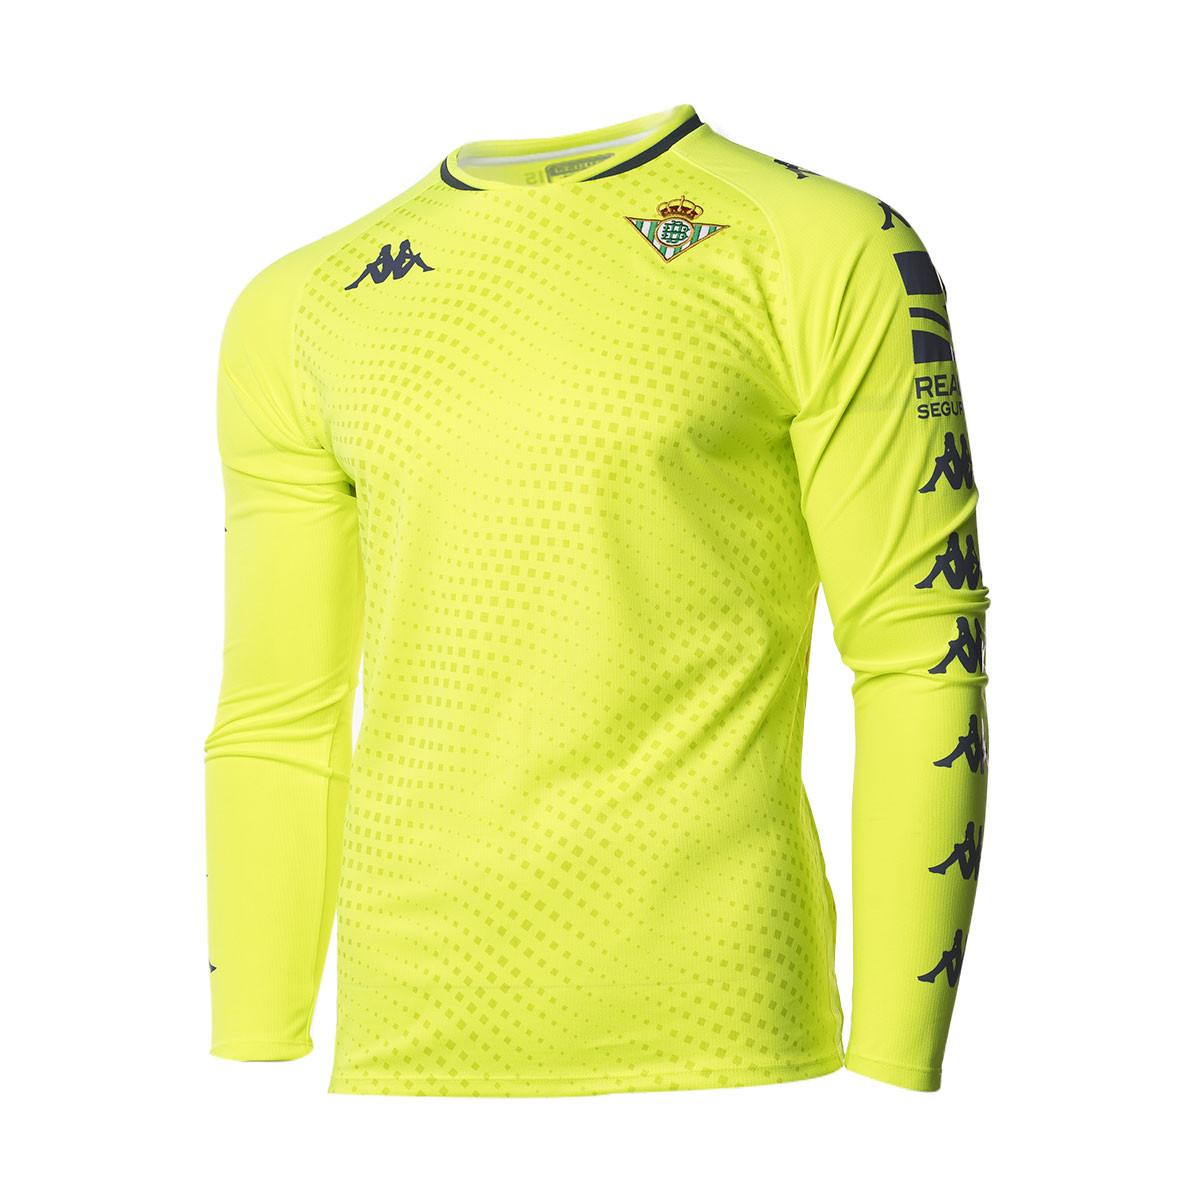 Kappa Real Betis Balompié Goalkeeper Away Jersey 2020-2021 Jersey